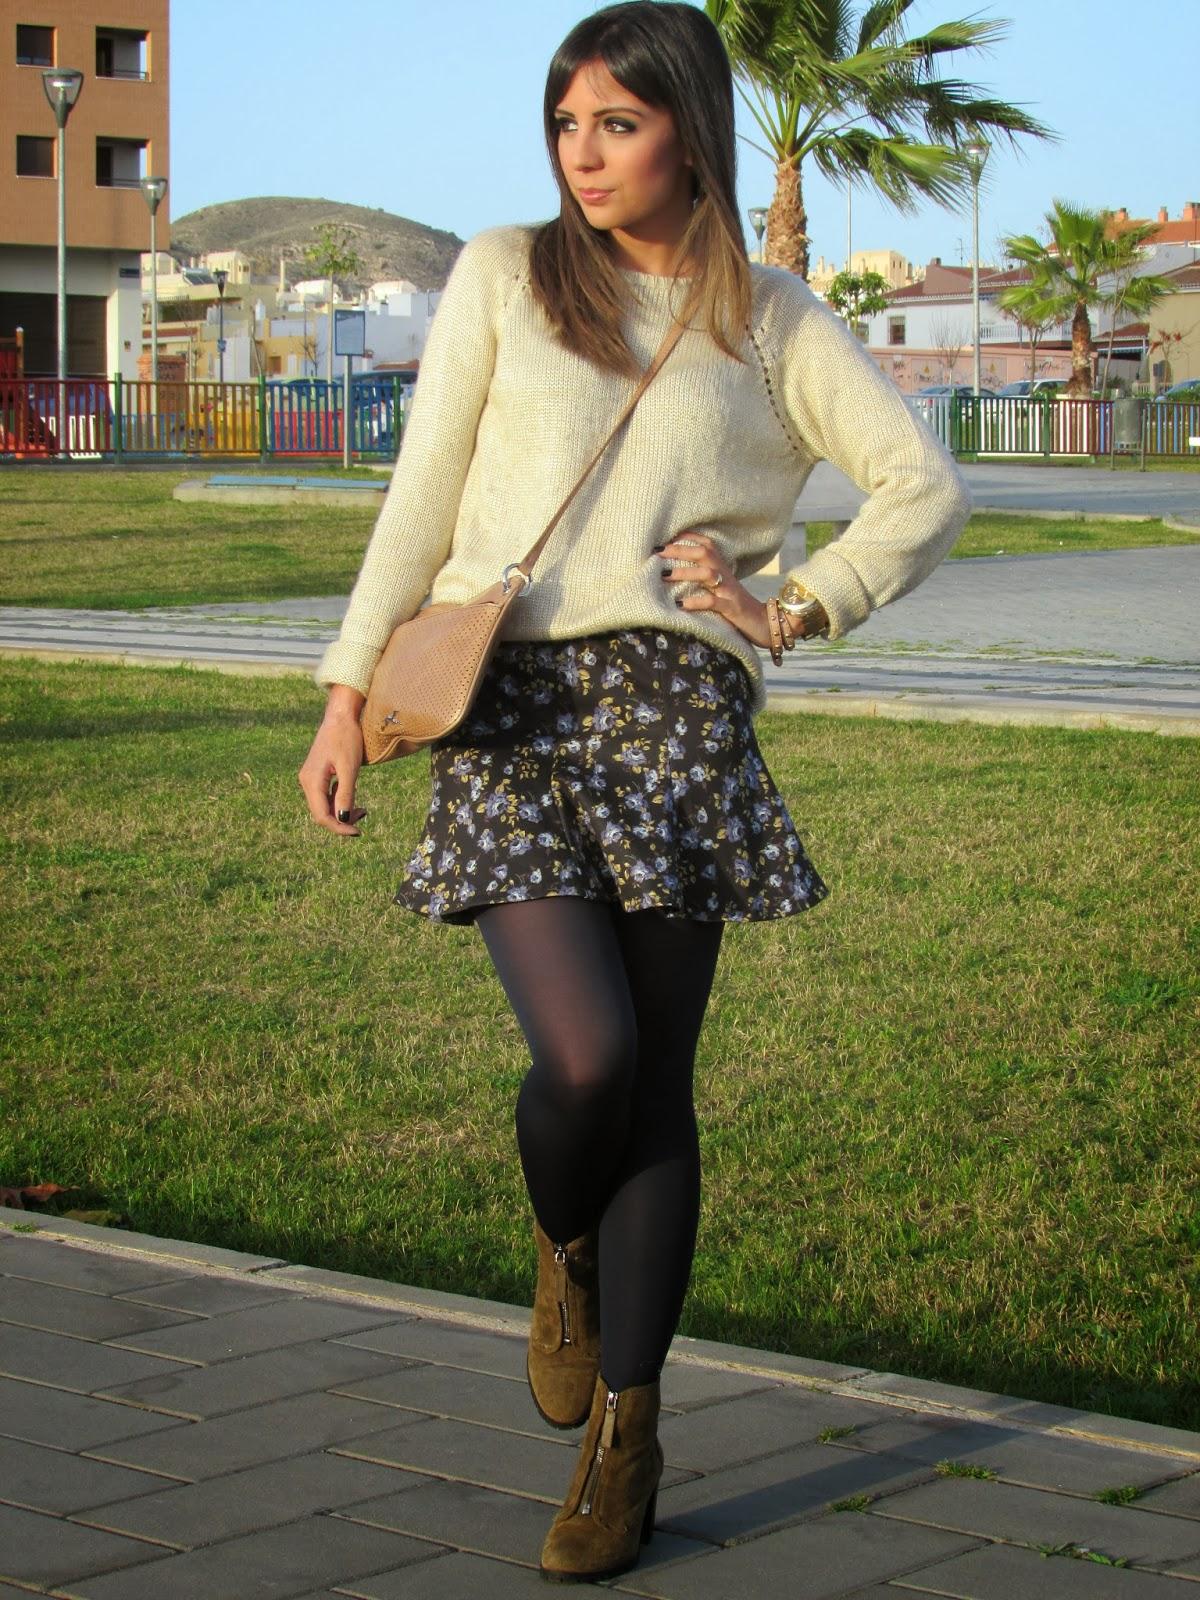 street style cristina style fashion blogger malagueña blogger malaga inspiration ootd outfit look zara mango tendencias modas casual chic teenvogue stylekiu